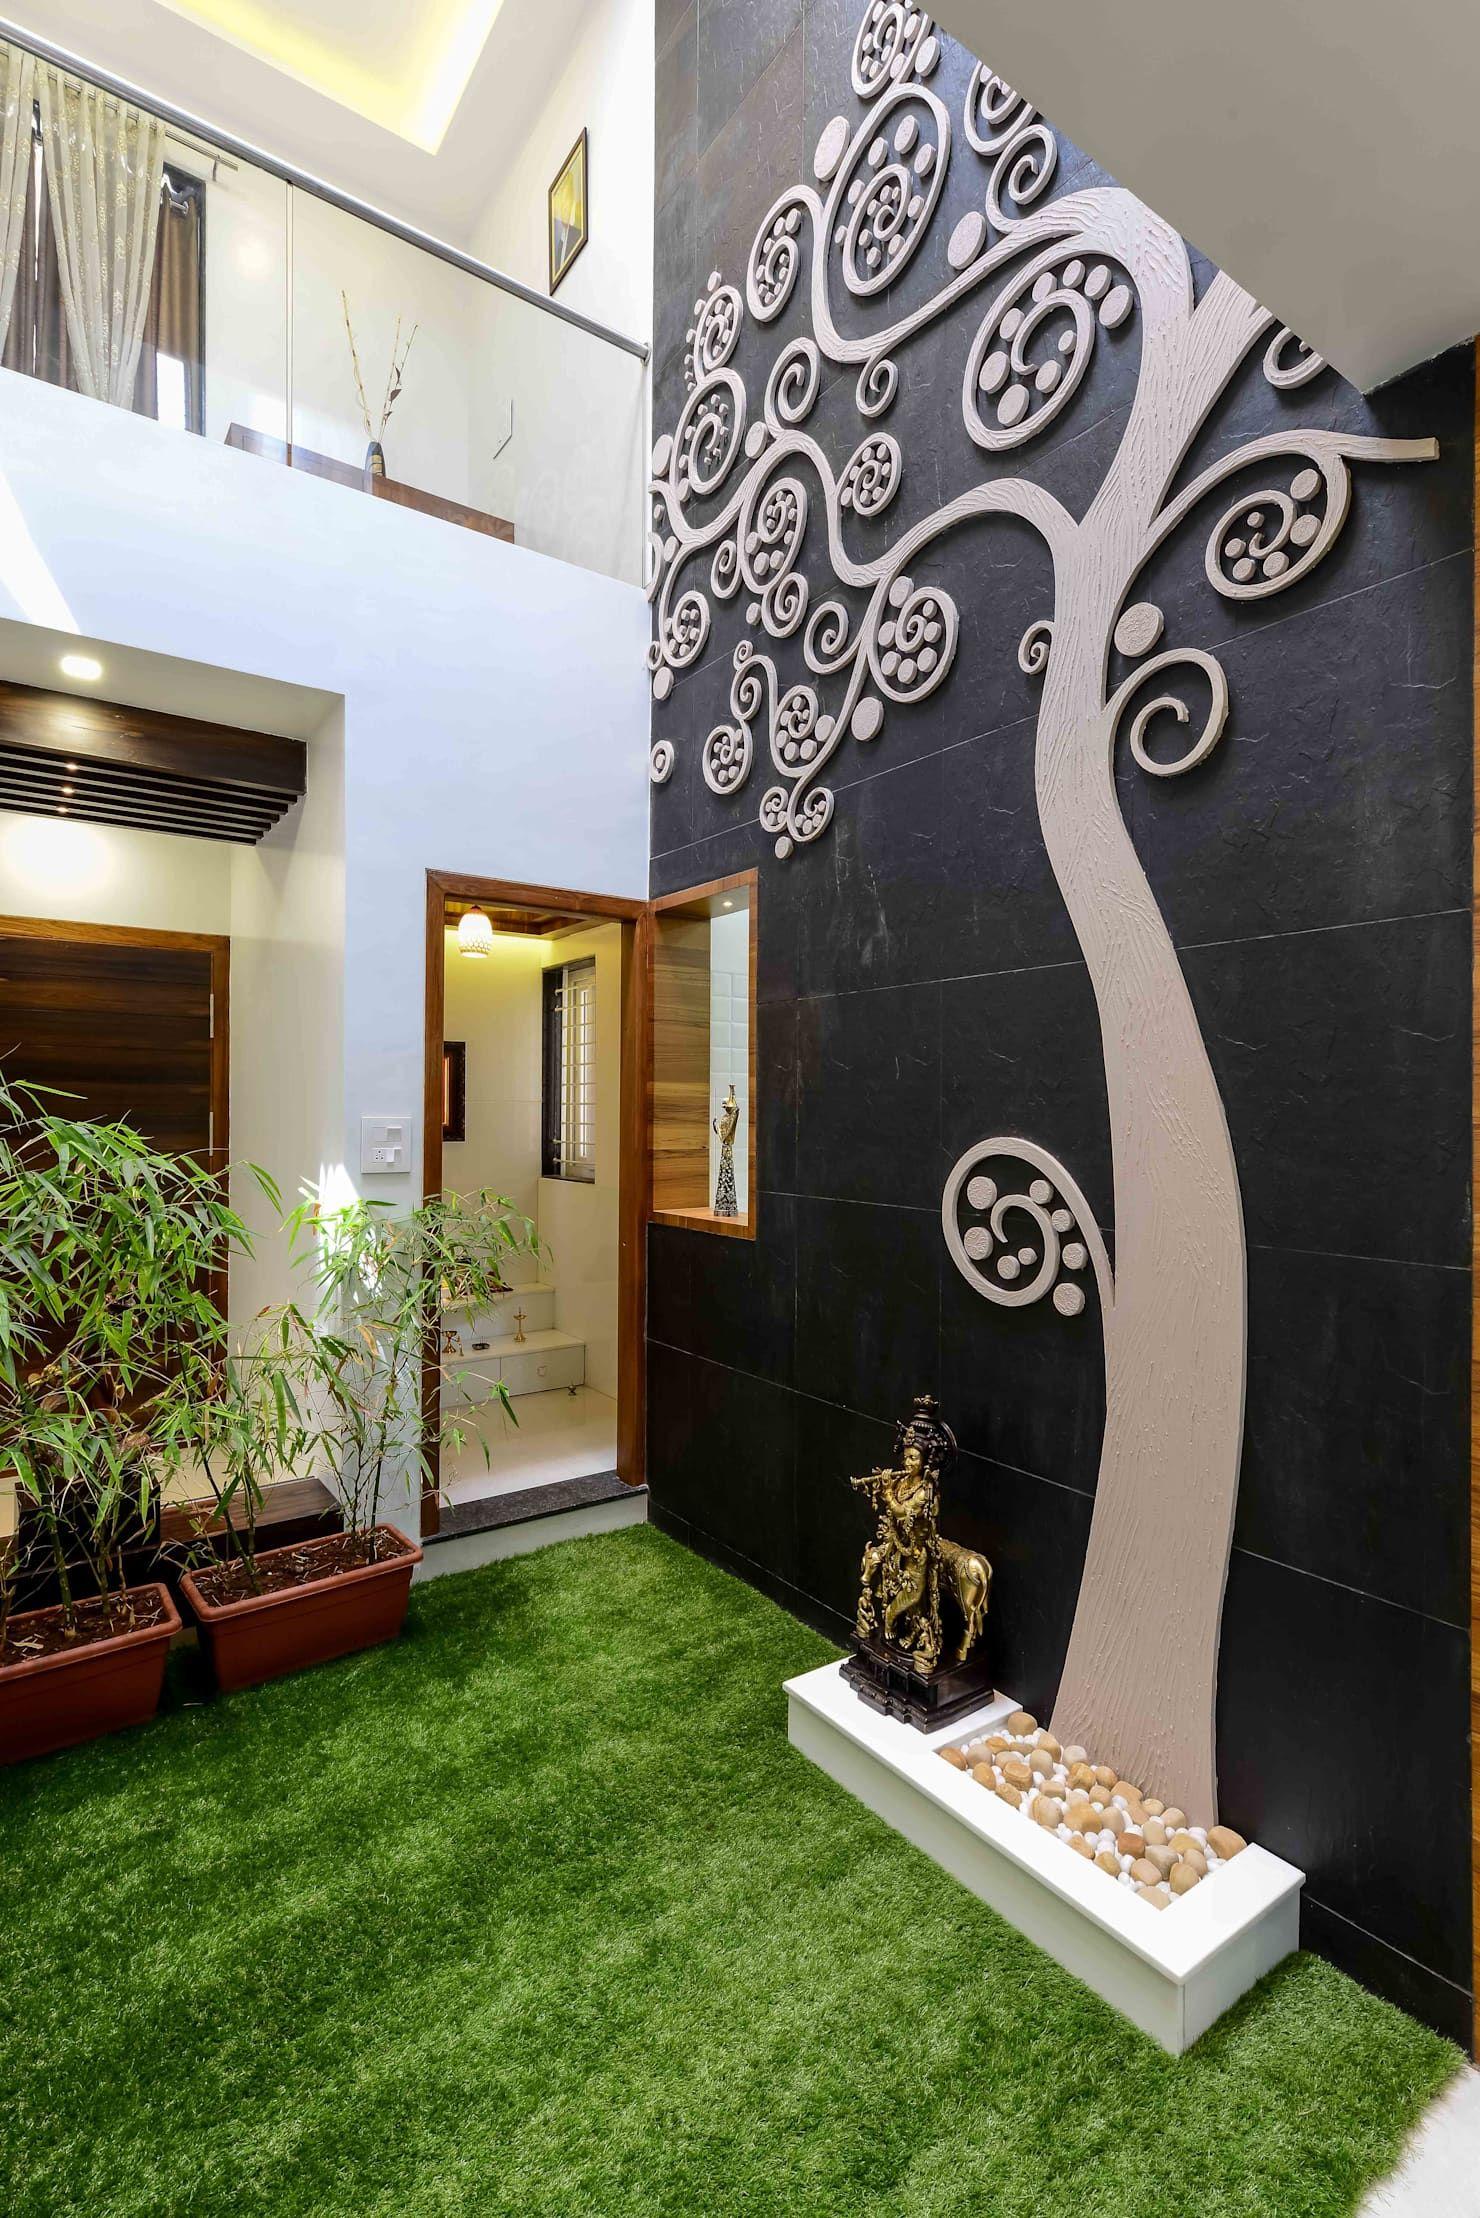 Courtyard With Mandir Minimalist Living Room By A B Design Studio Minimalist In 2020 Bungalow Design Interior Design Your Home Home Room Design